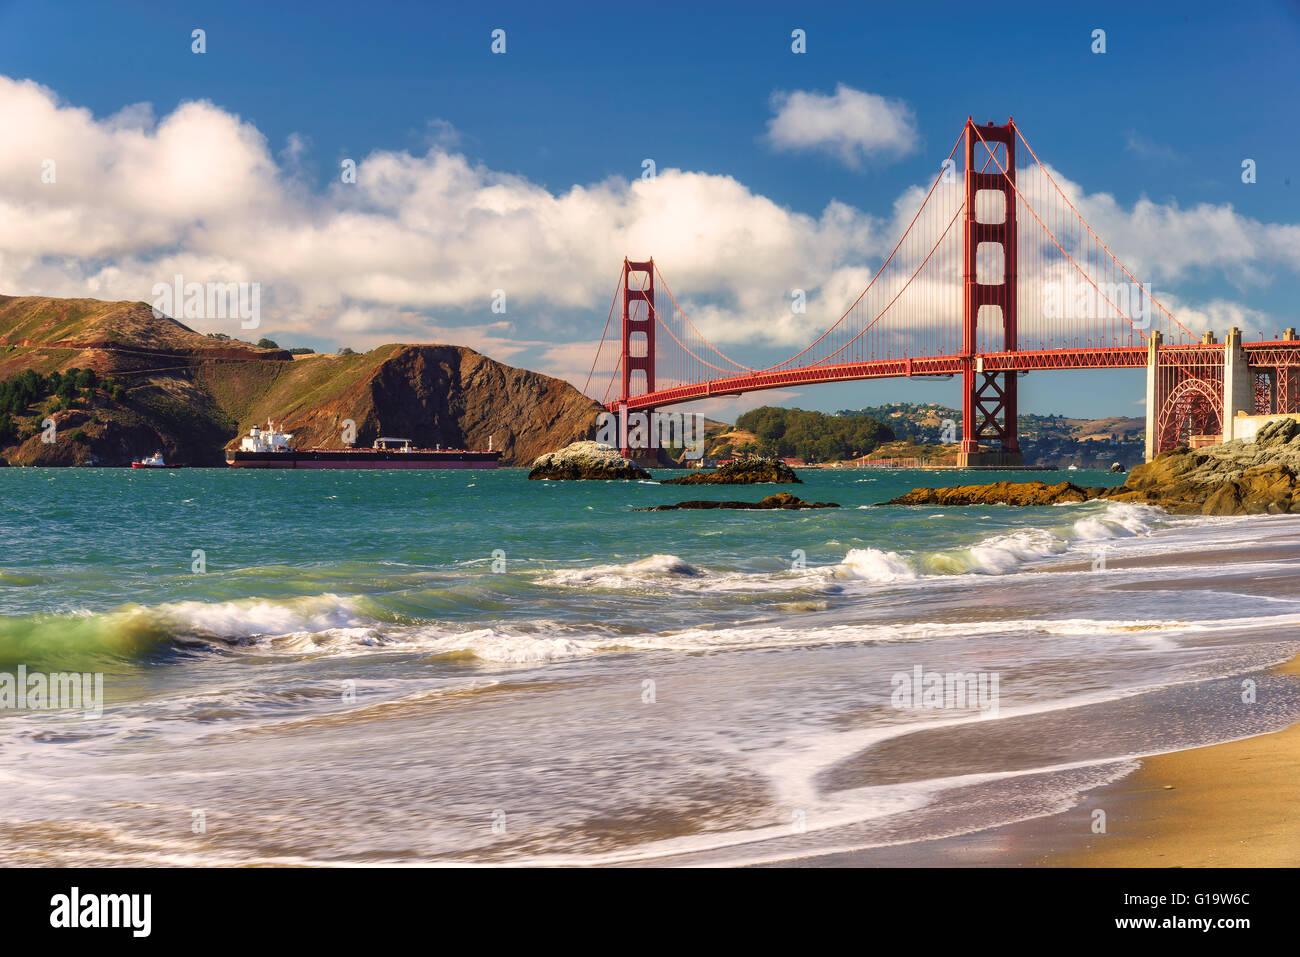 Puente Golden Gate de Marshall Beach, San Francisco. Imagen De Stock